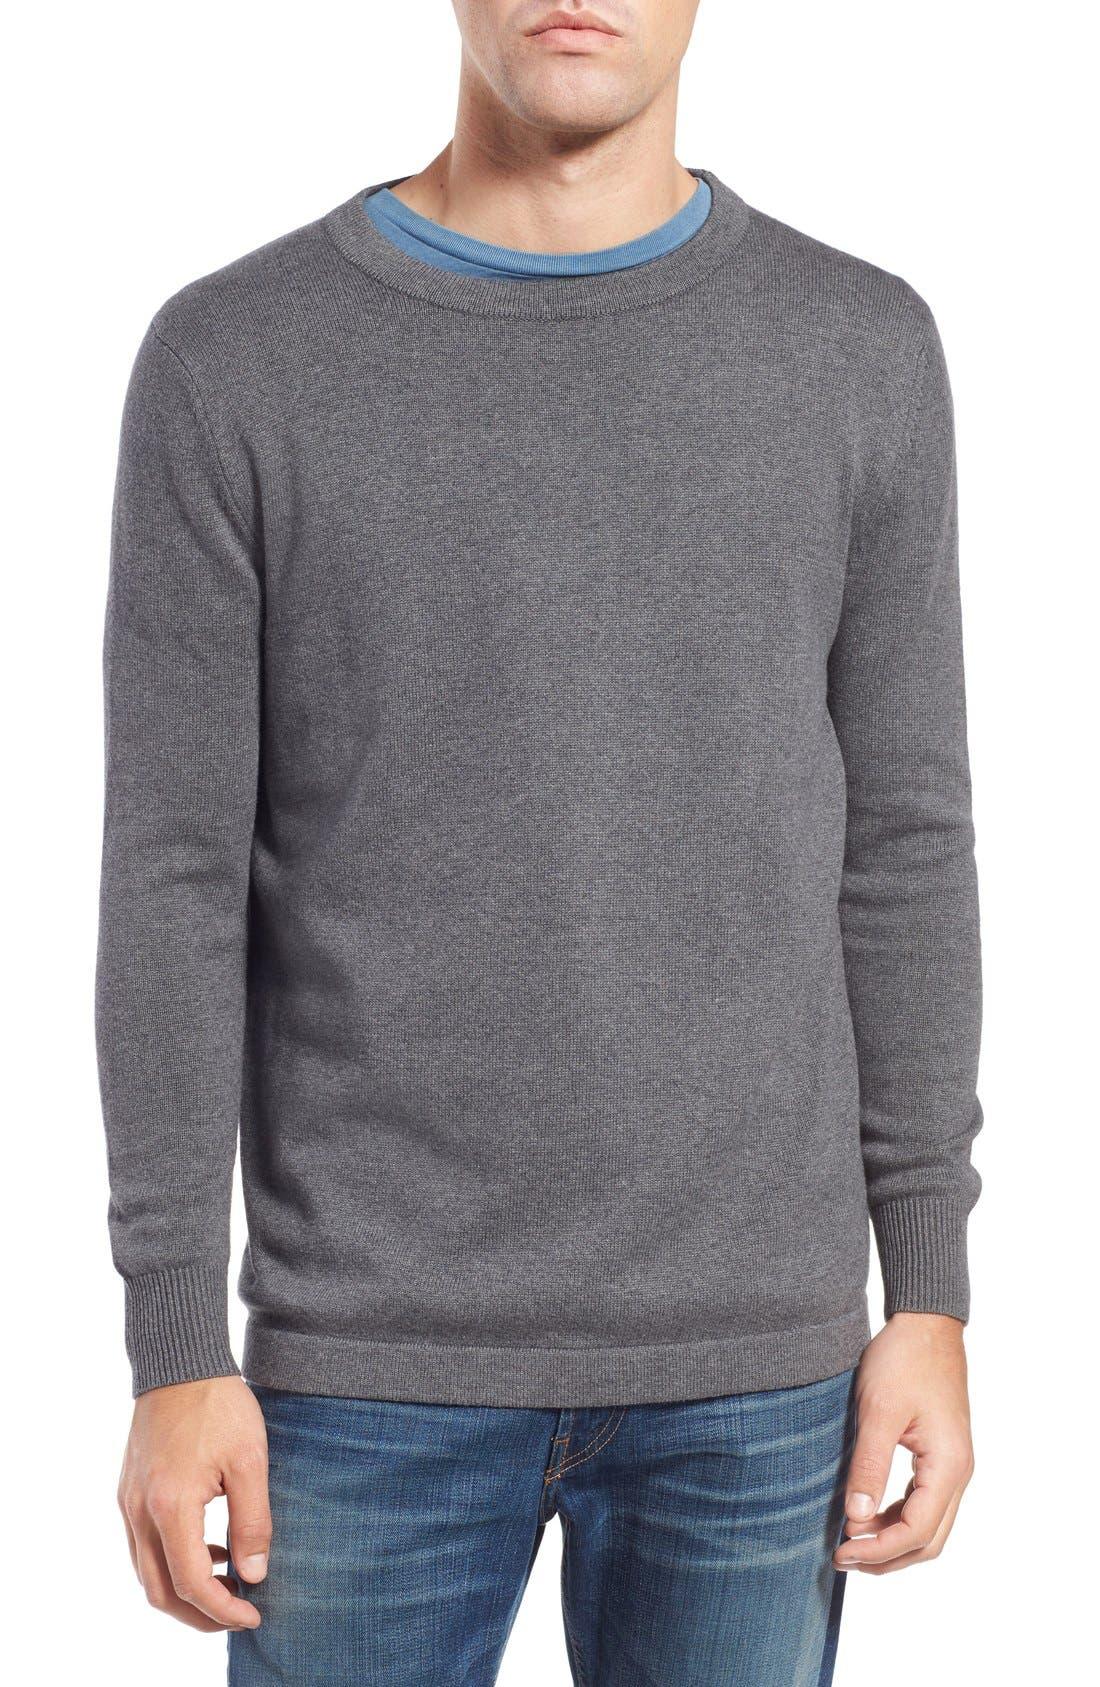 'San Francisco' Crewneck Sweater,                         Main,                         color, Ash